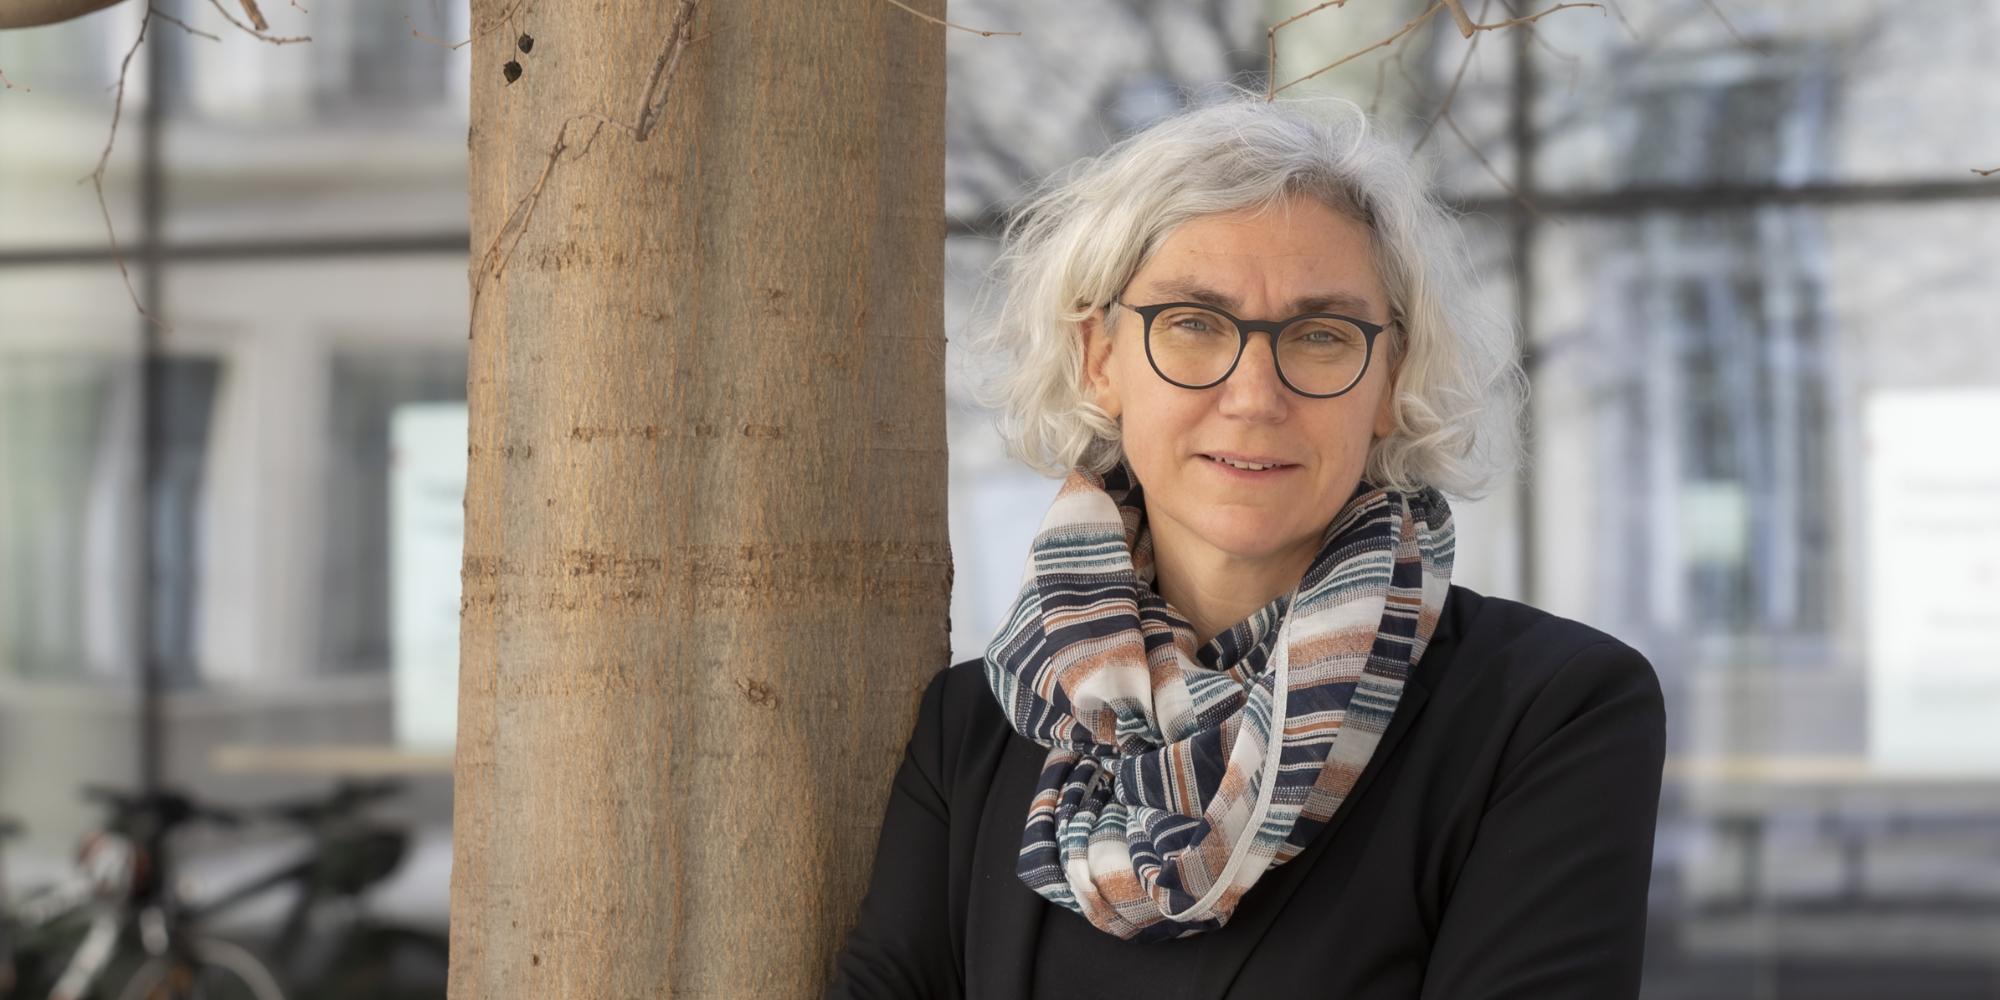 Barbara Siegmund